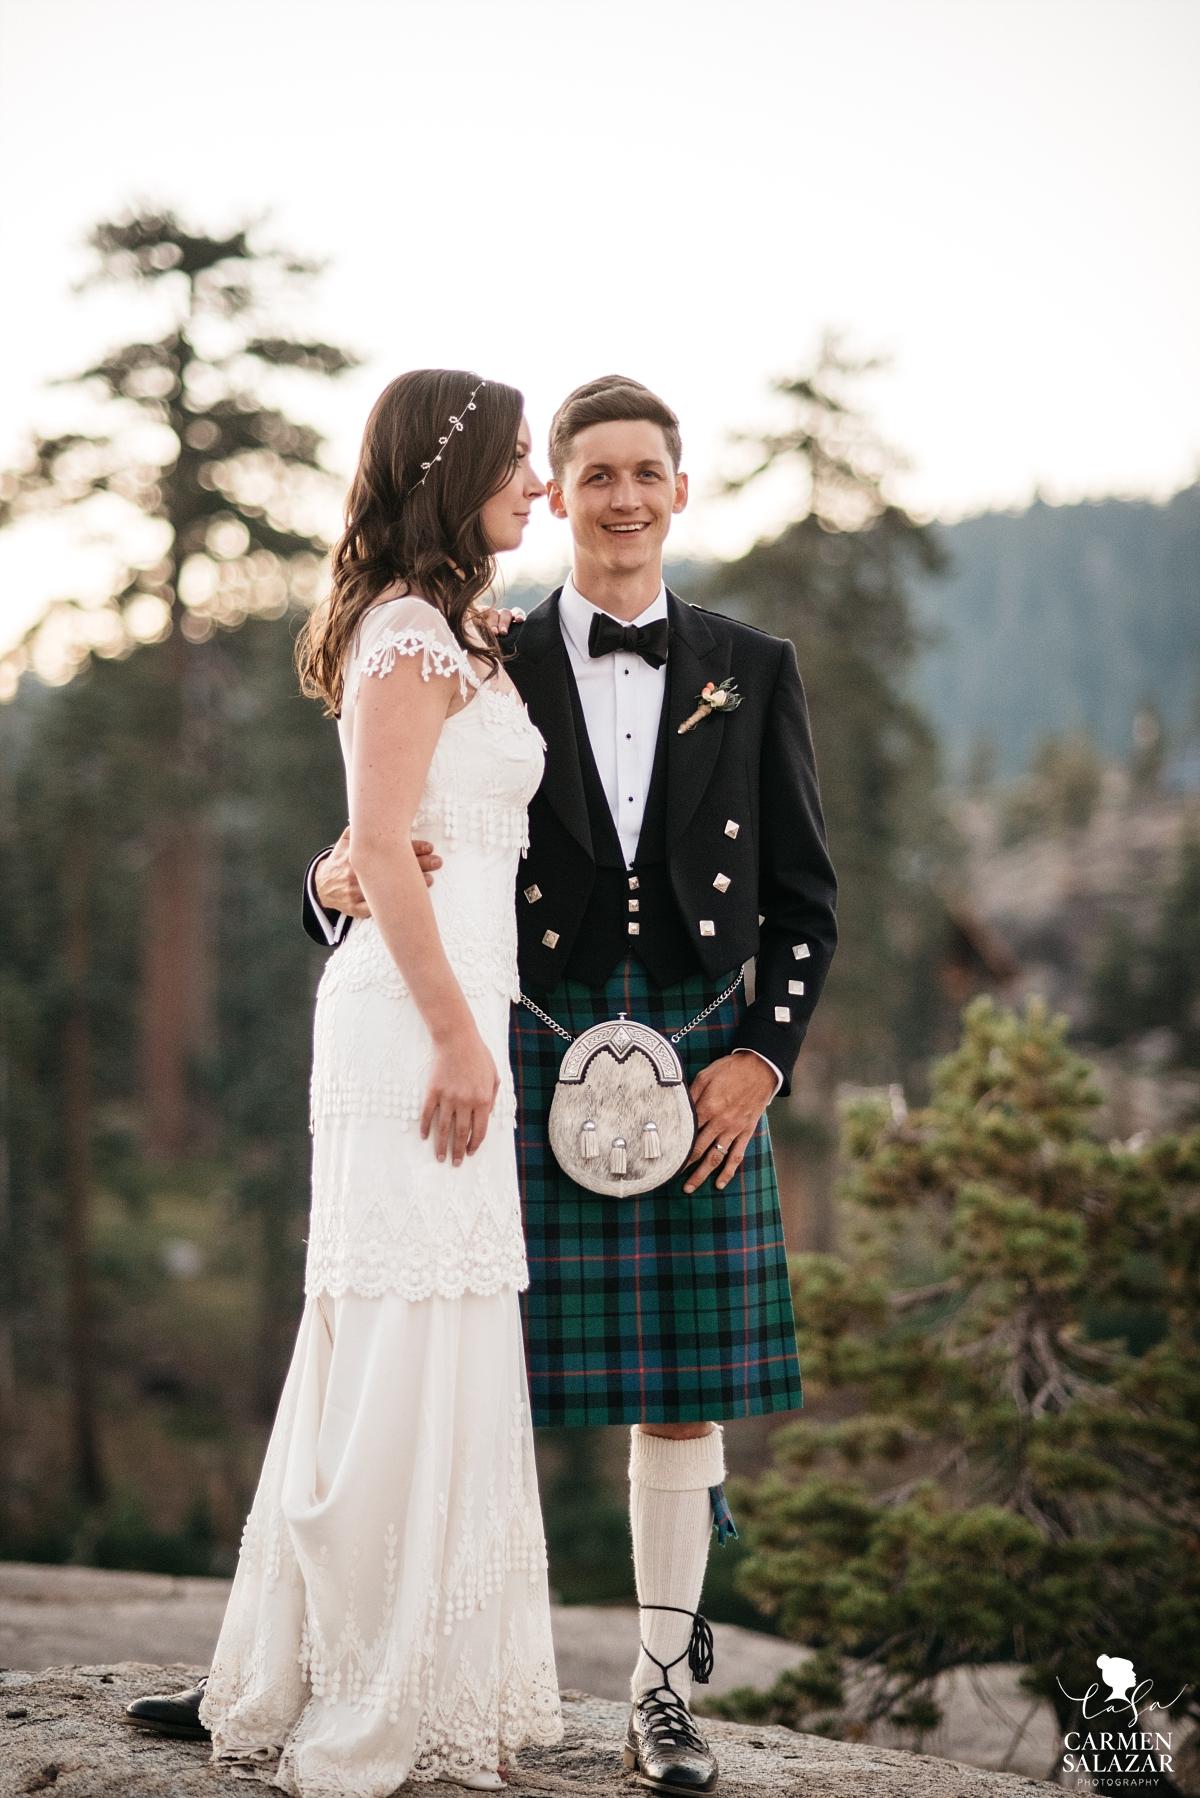 Sunset mountain top wedding photography - Carmen Salazar